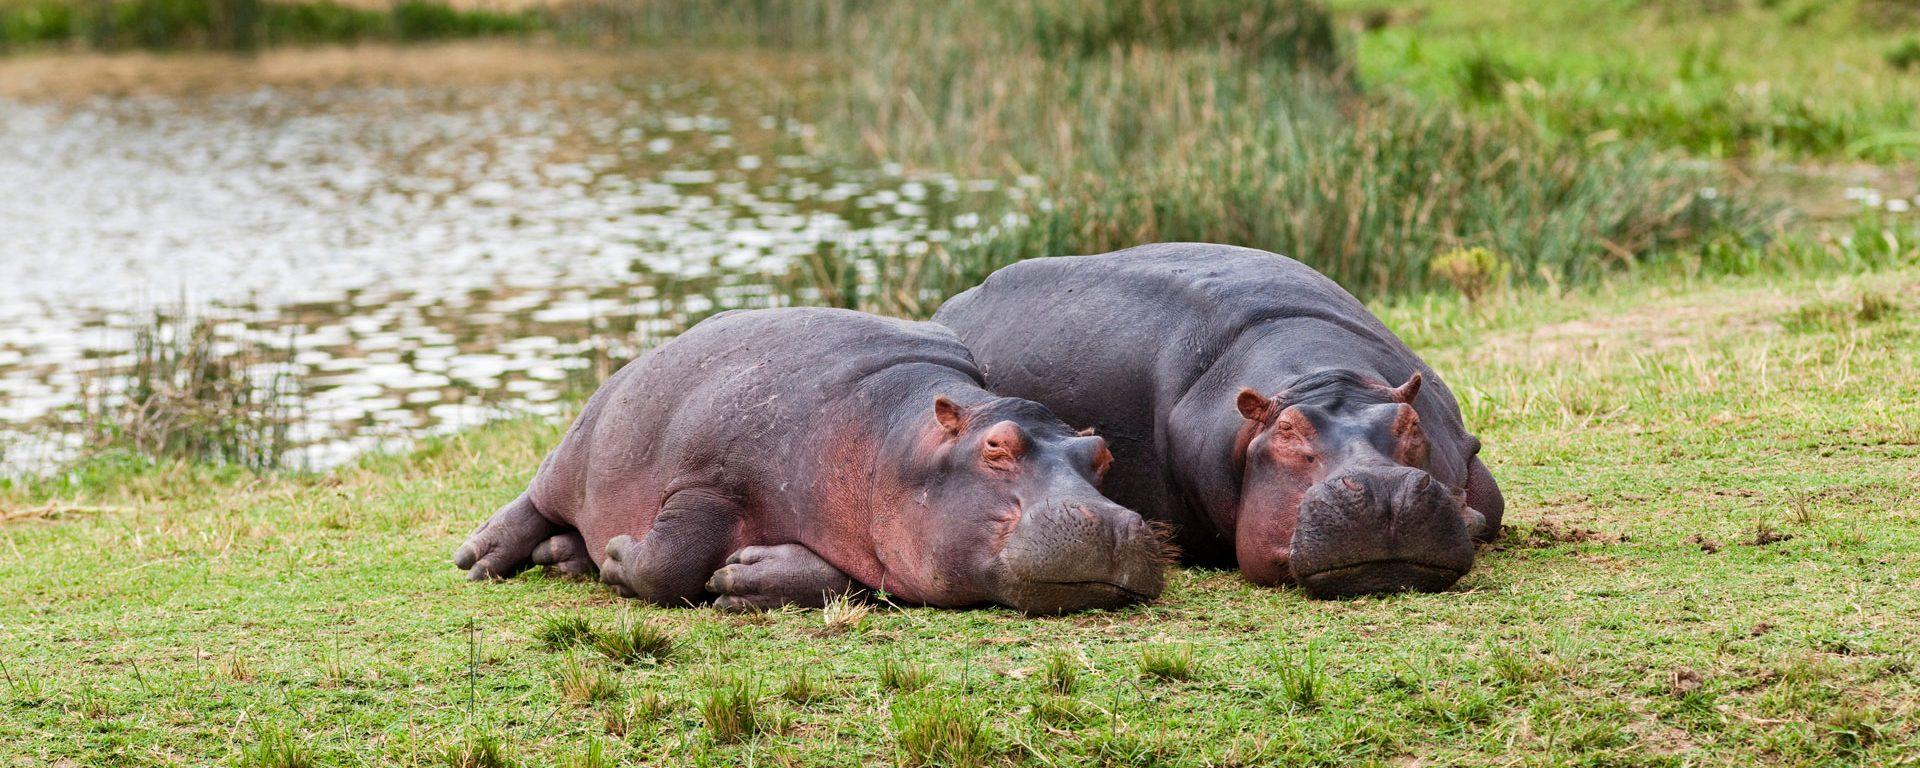 Hippopotamus laying on the shore, Queen Elizabeth National Park, Uganda